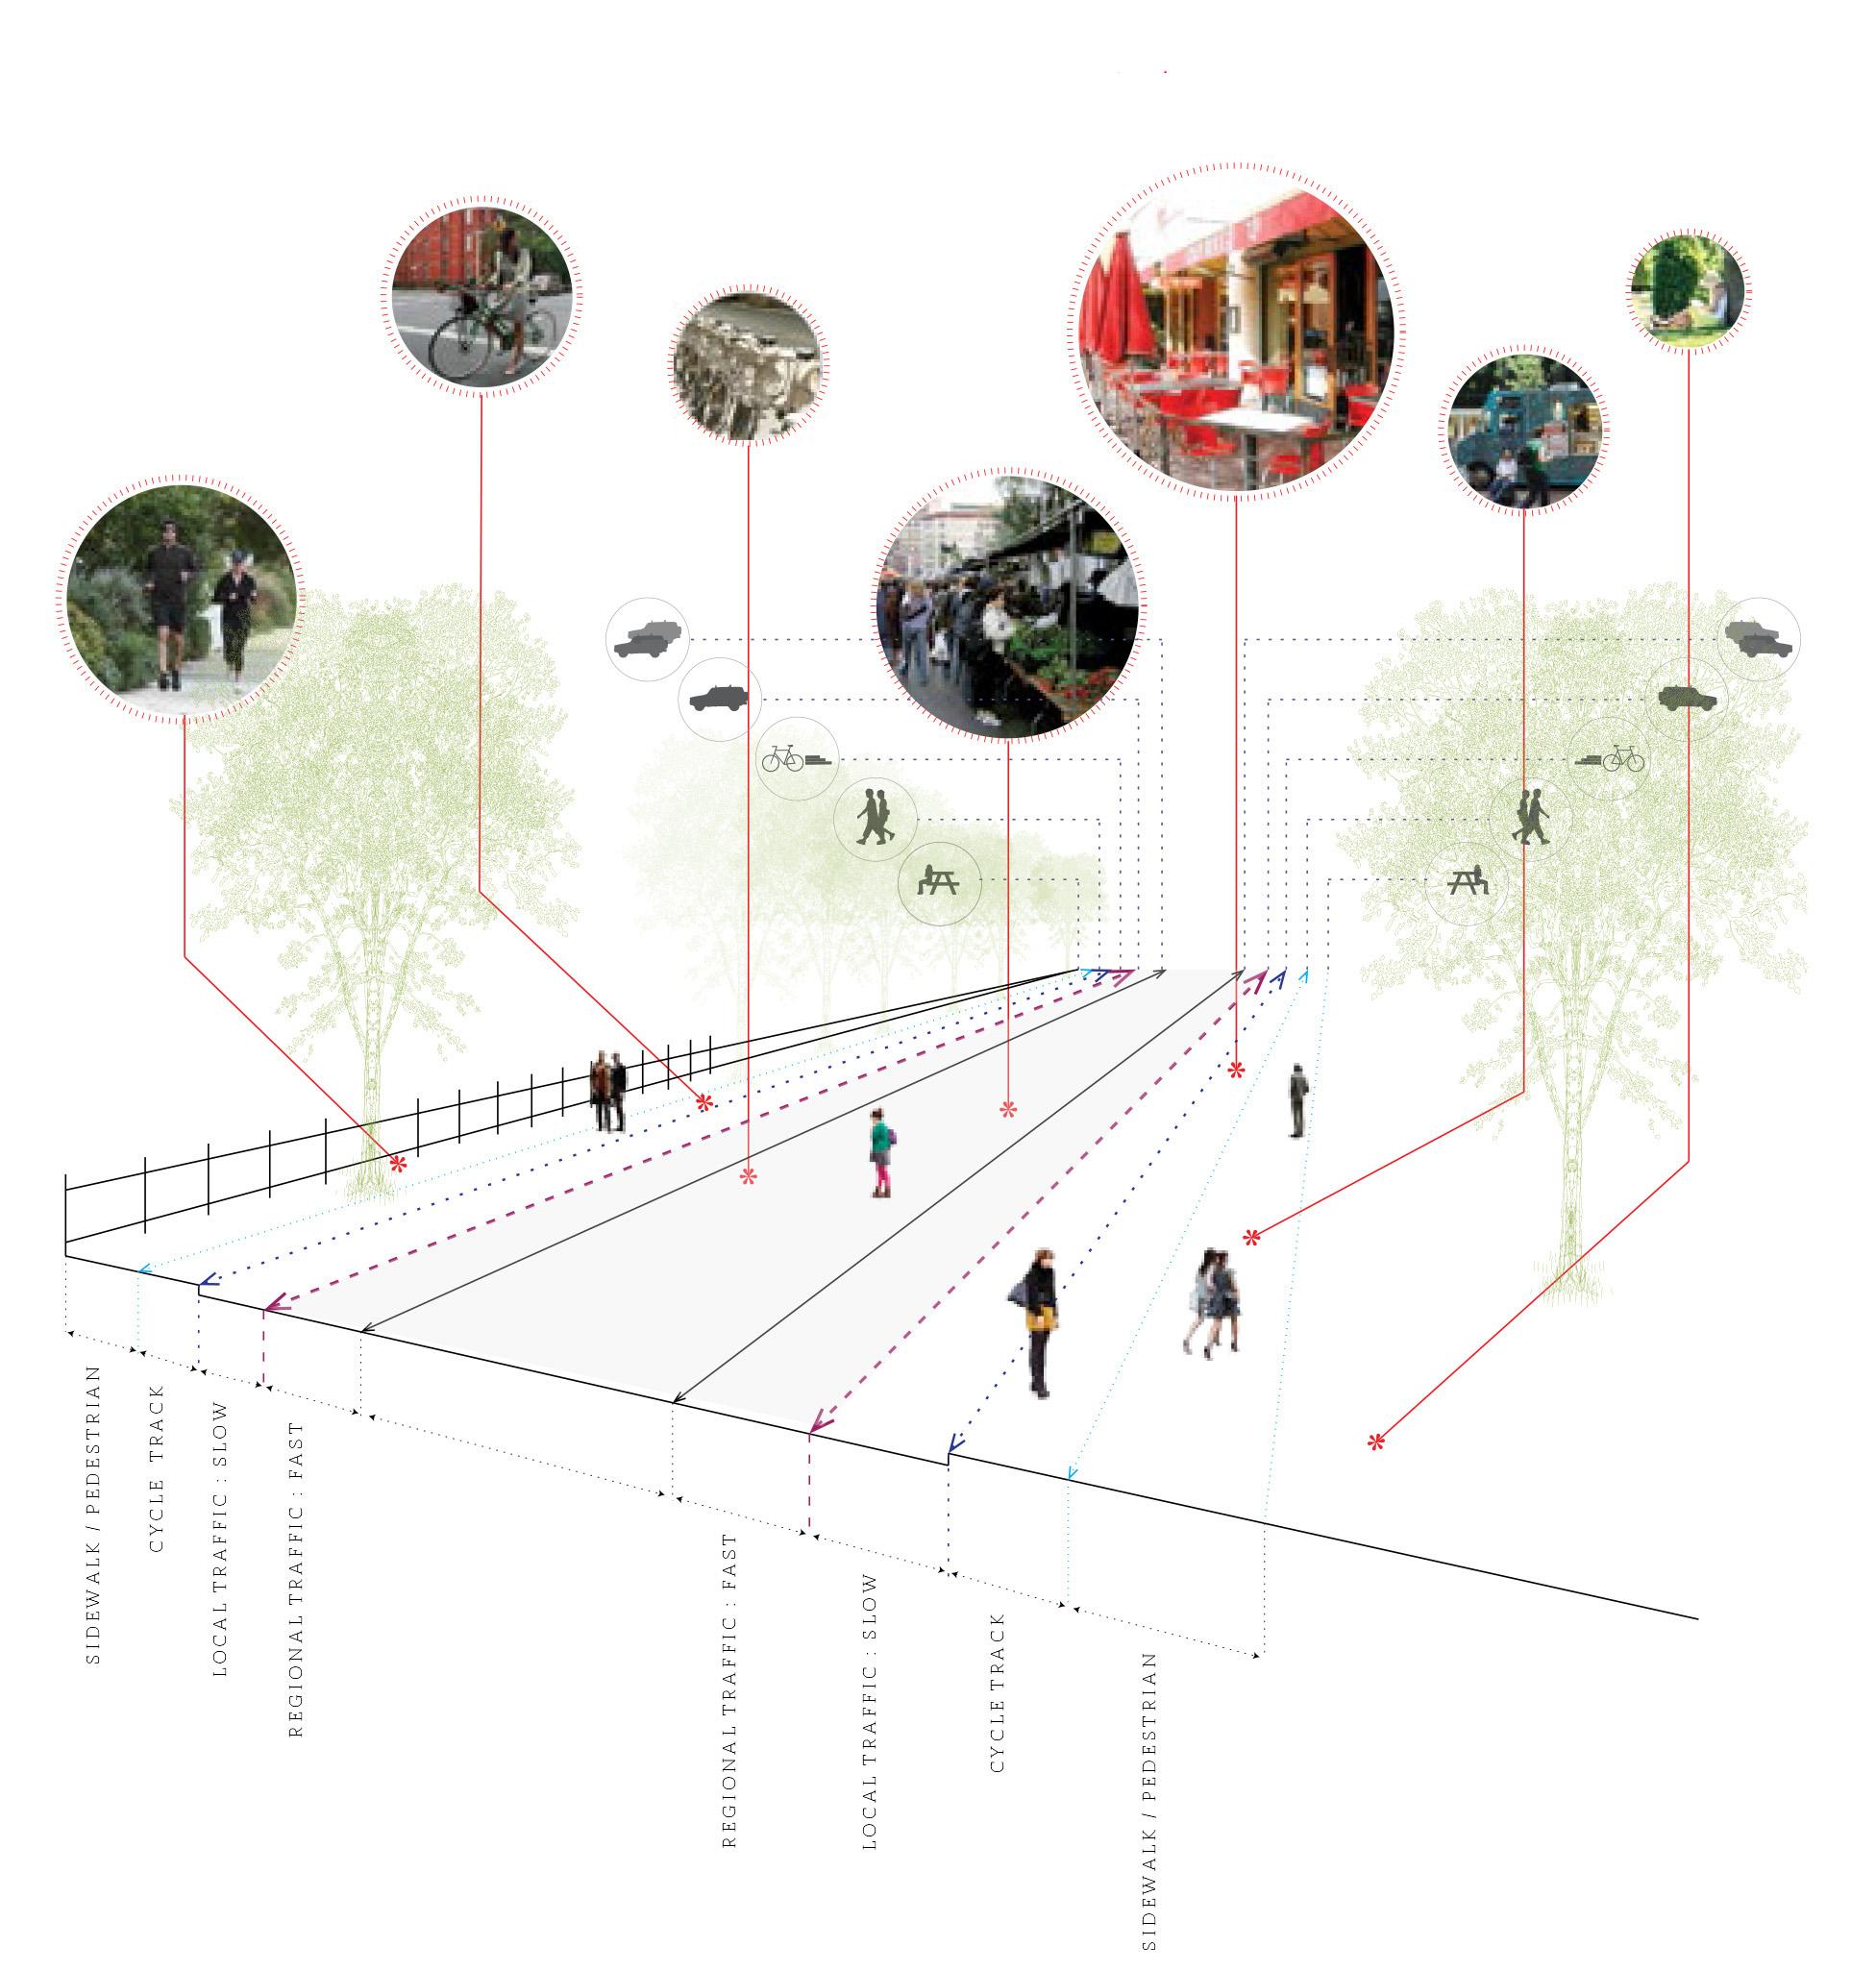 In collaboration with Schulze and Grassov, Copenhagen